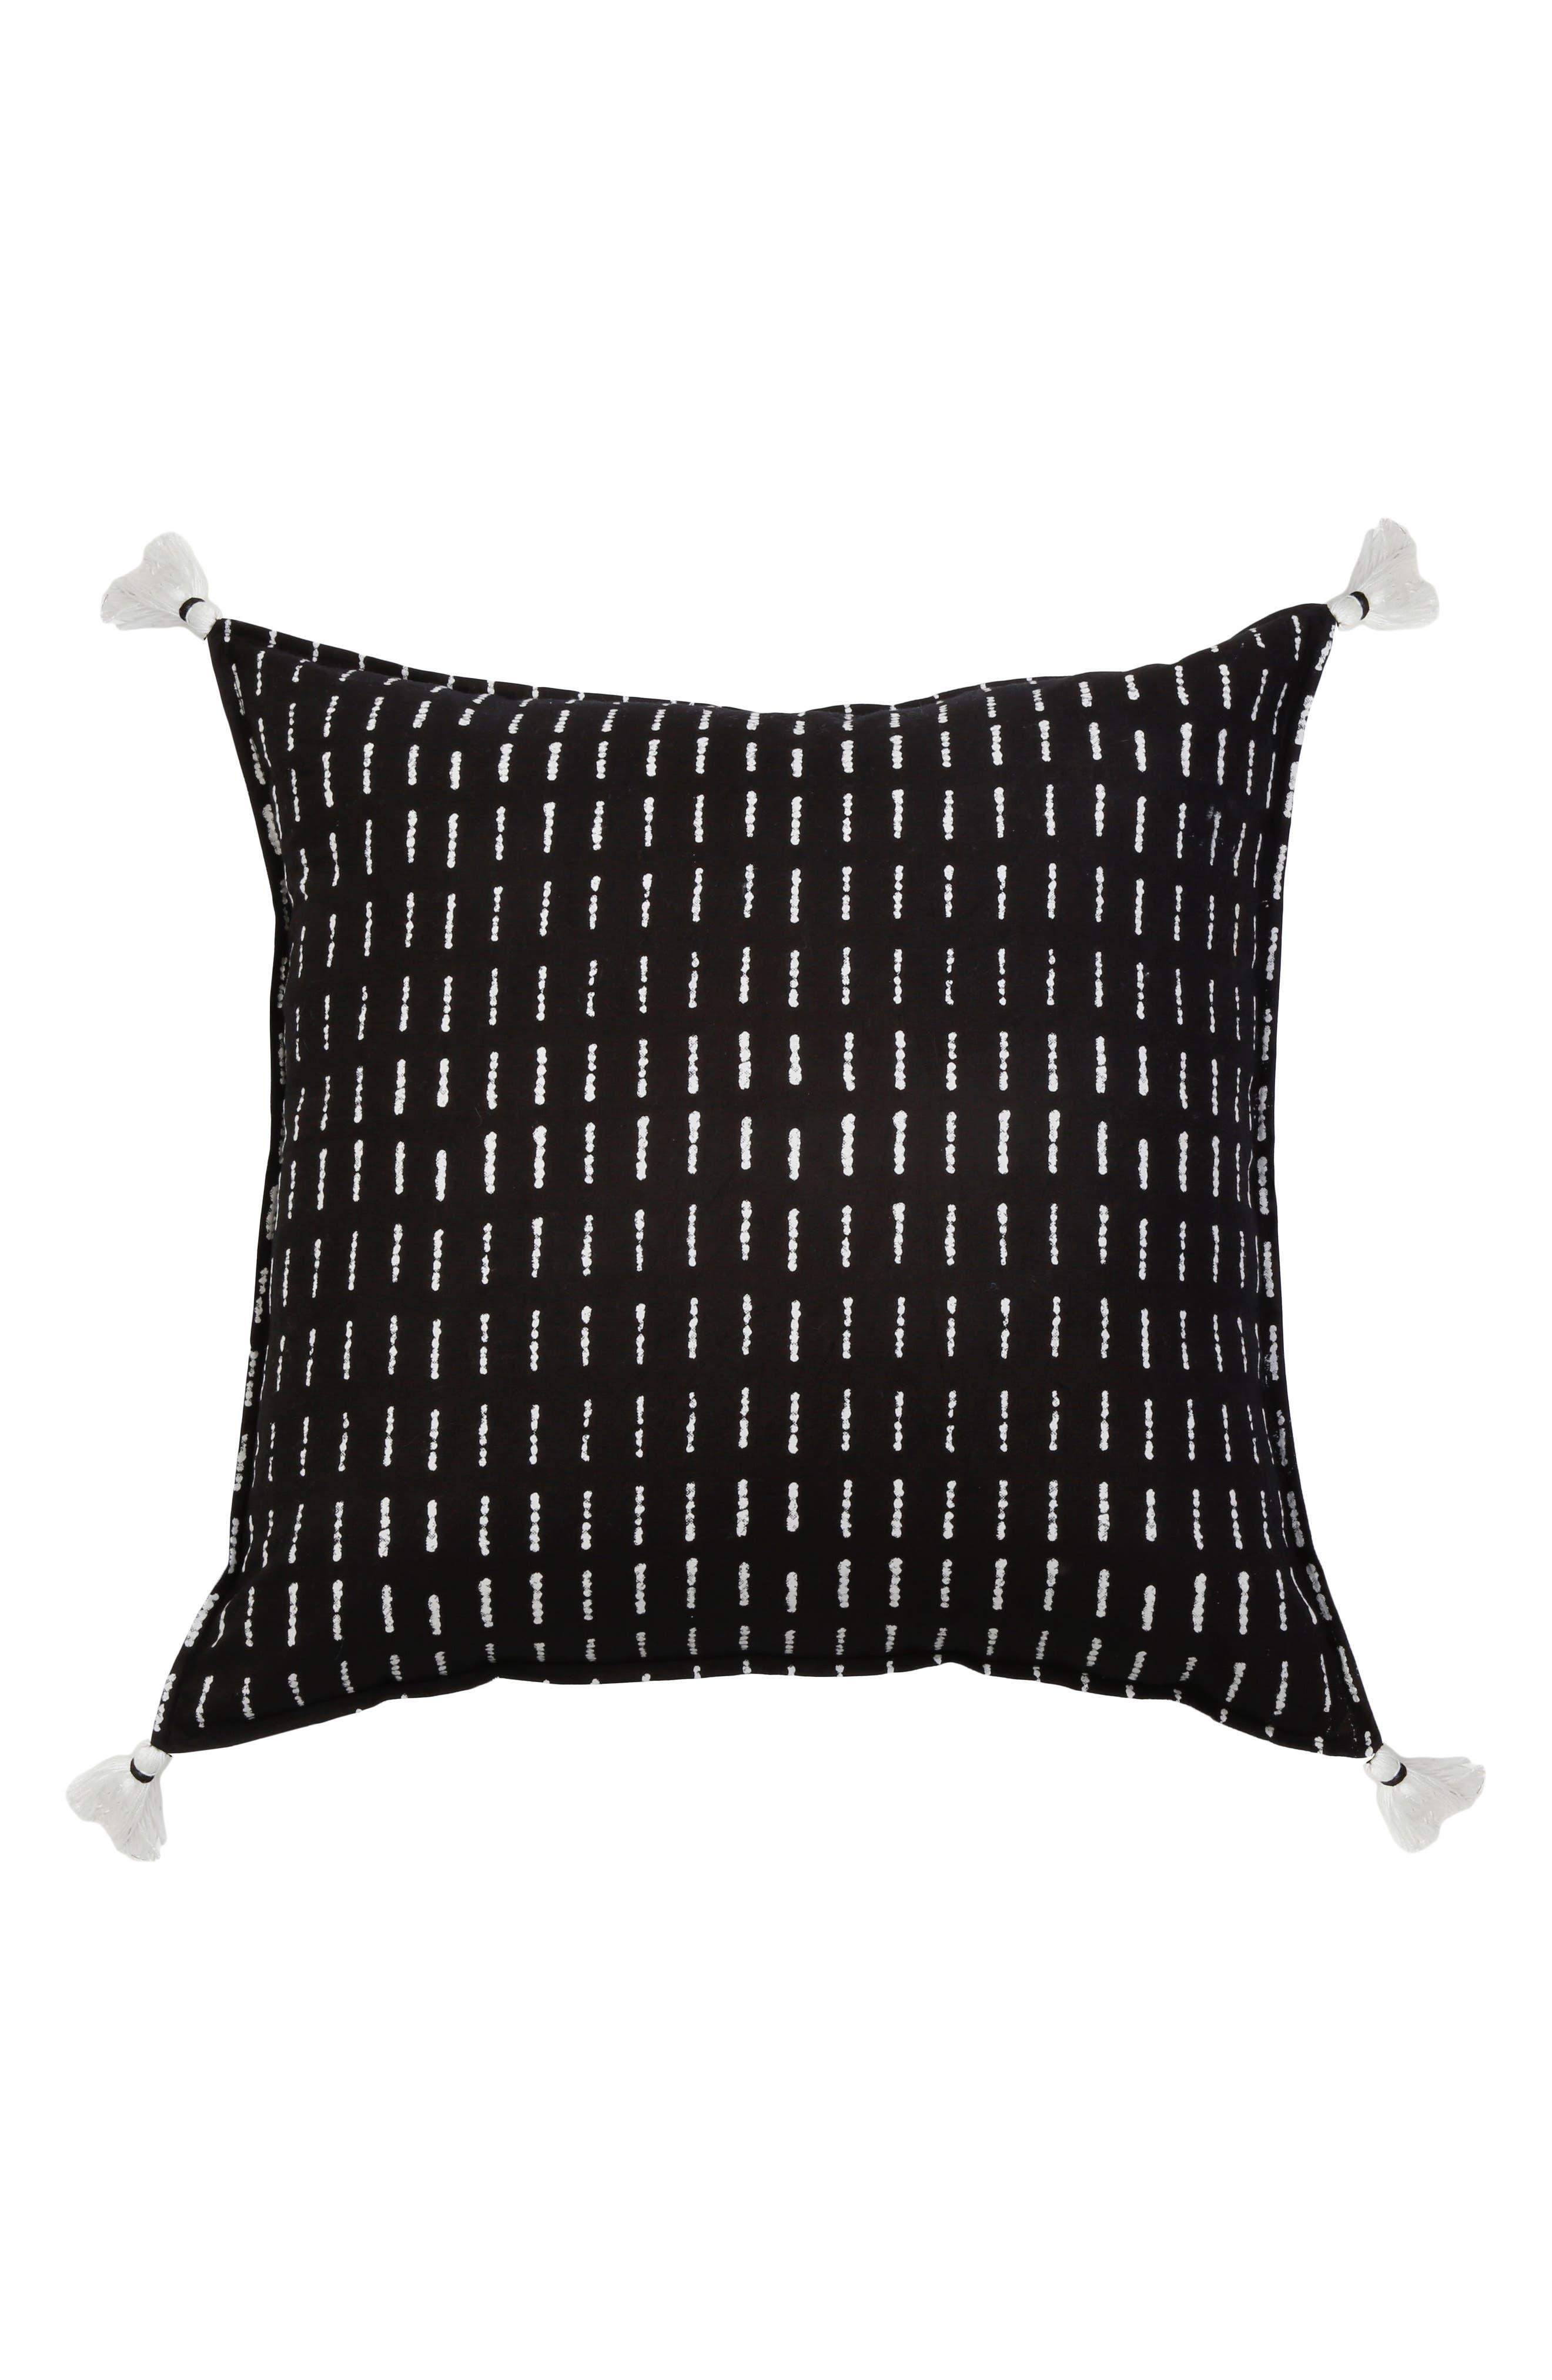 Dash Accent Pillow,                         Main,                         color, Black Multi